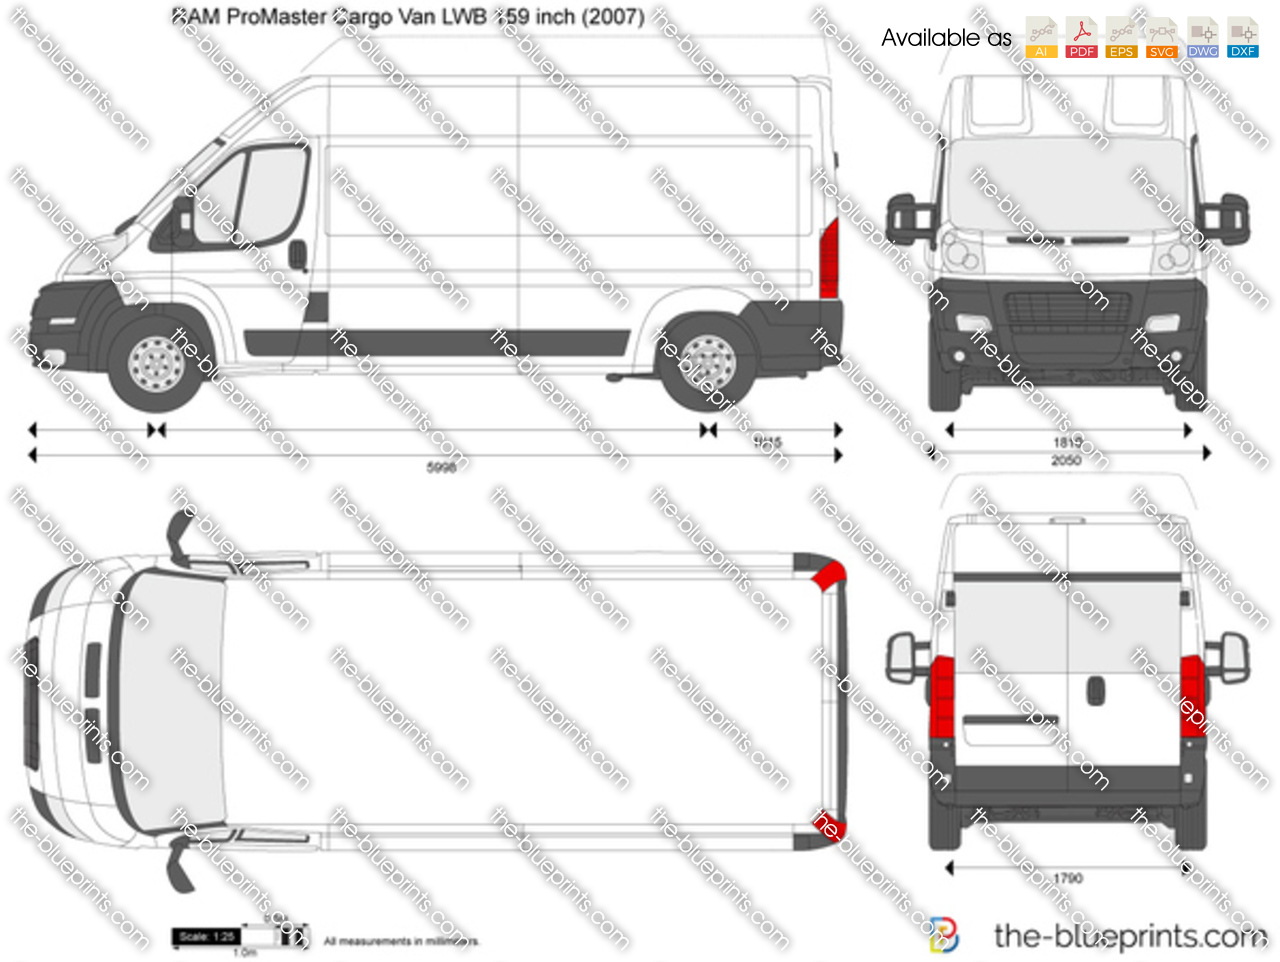 Ram Promaster Cargo Van Lwb 159 Inch Vector Drawing 2014 Dodge 2017